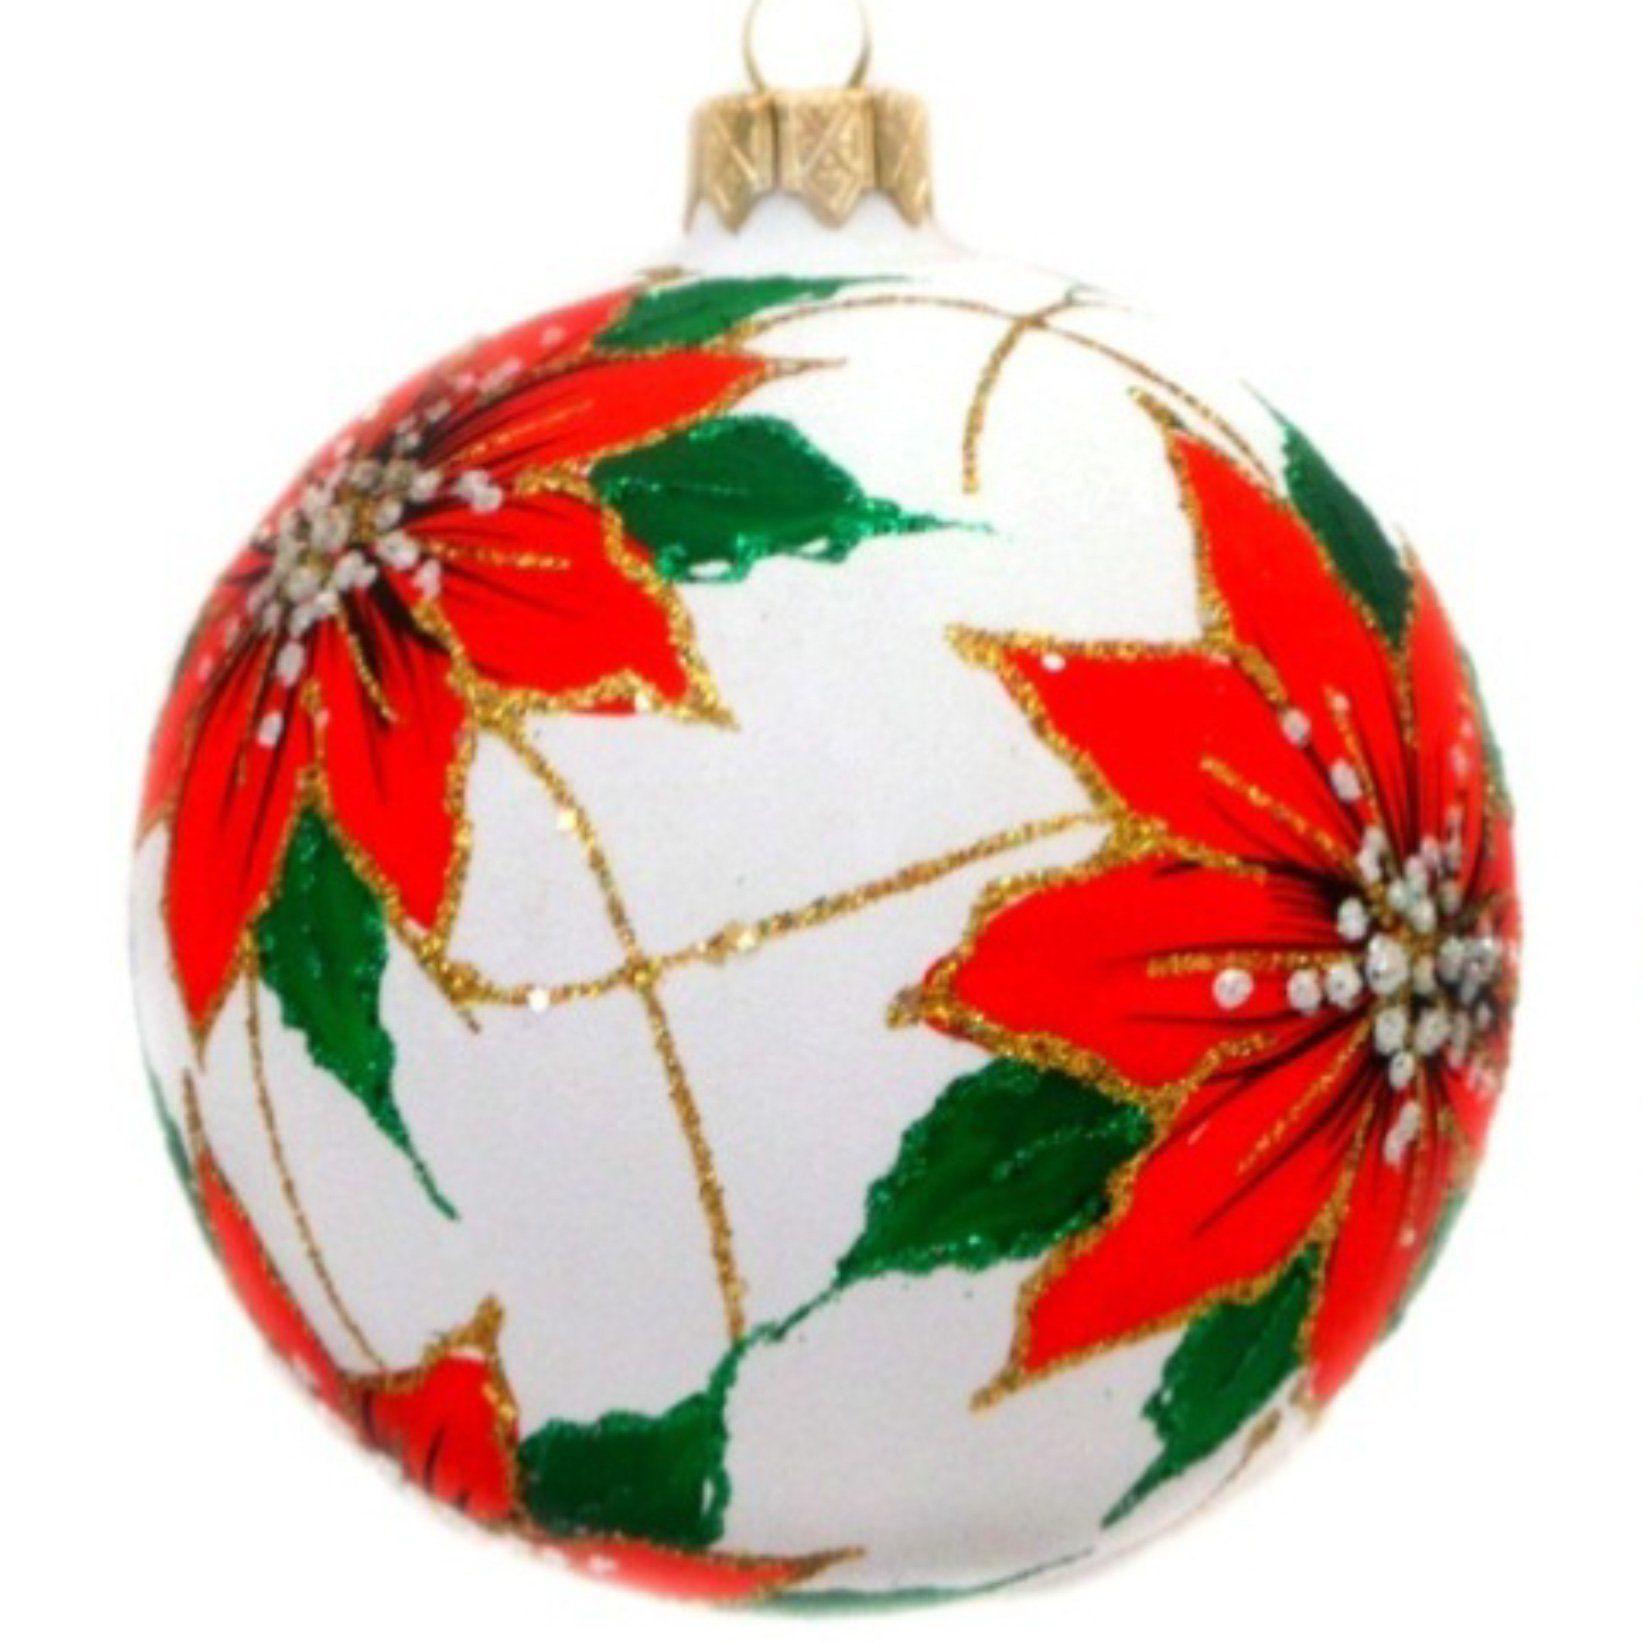 Poinsettia Flowers On White Glass Ball Christmas Ornament Christmas Ornaments Christmas Ball Ornaments Diy Handpainted Christmas Ornaments